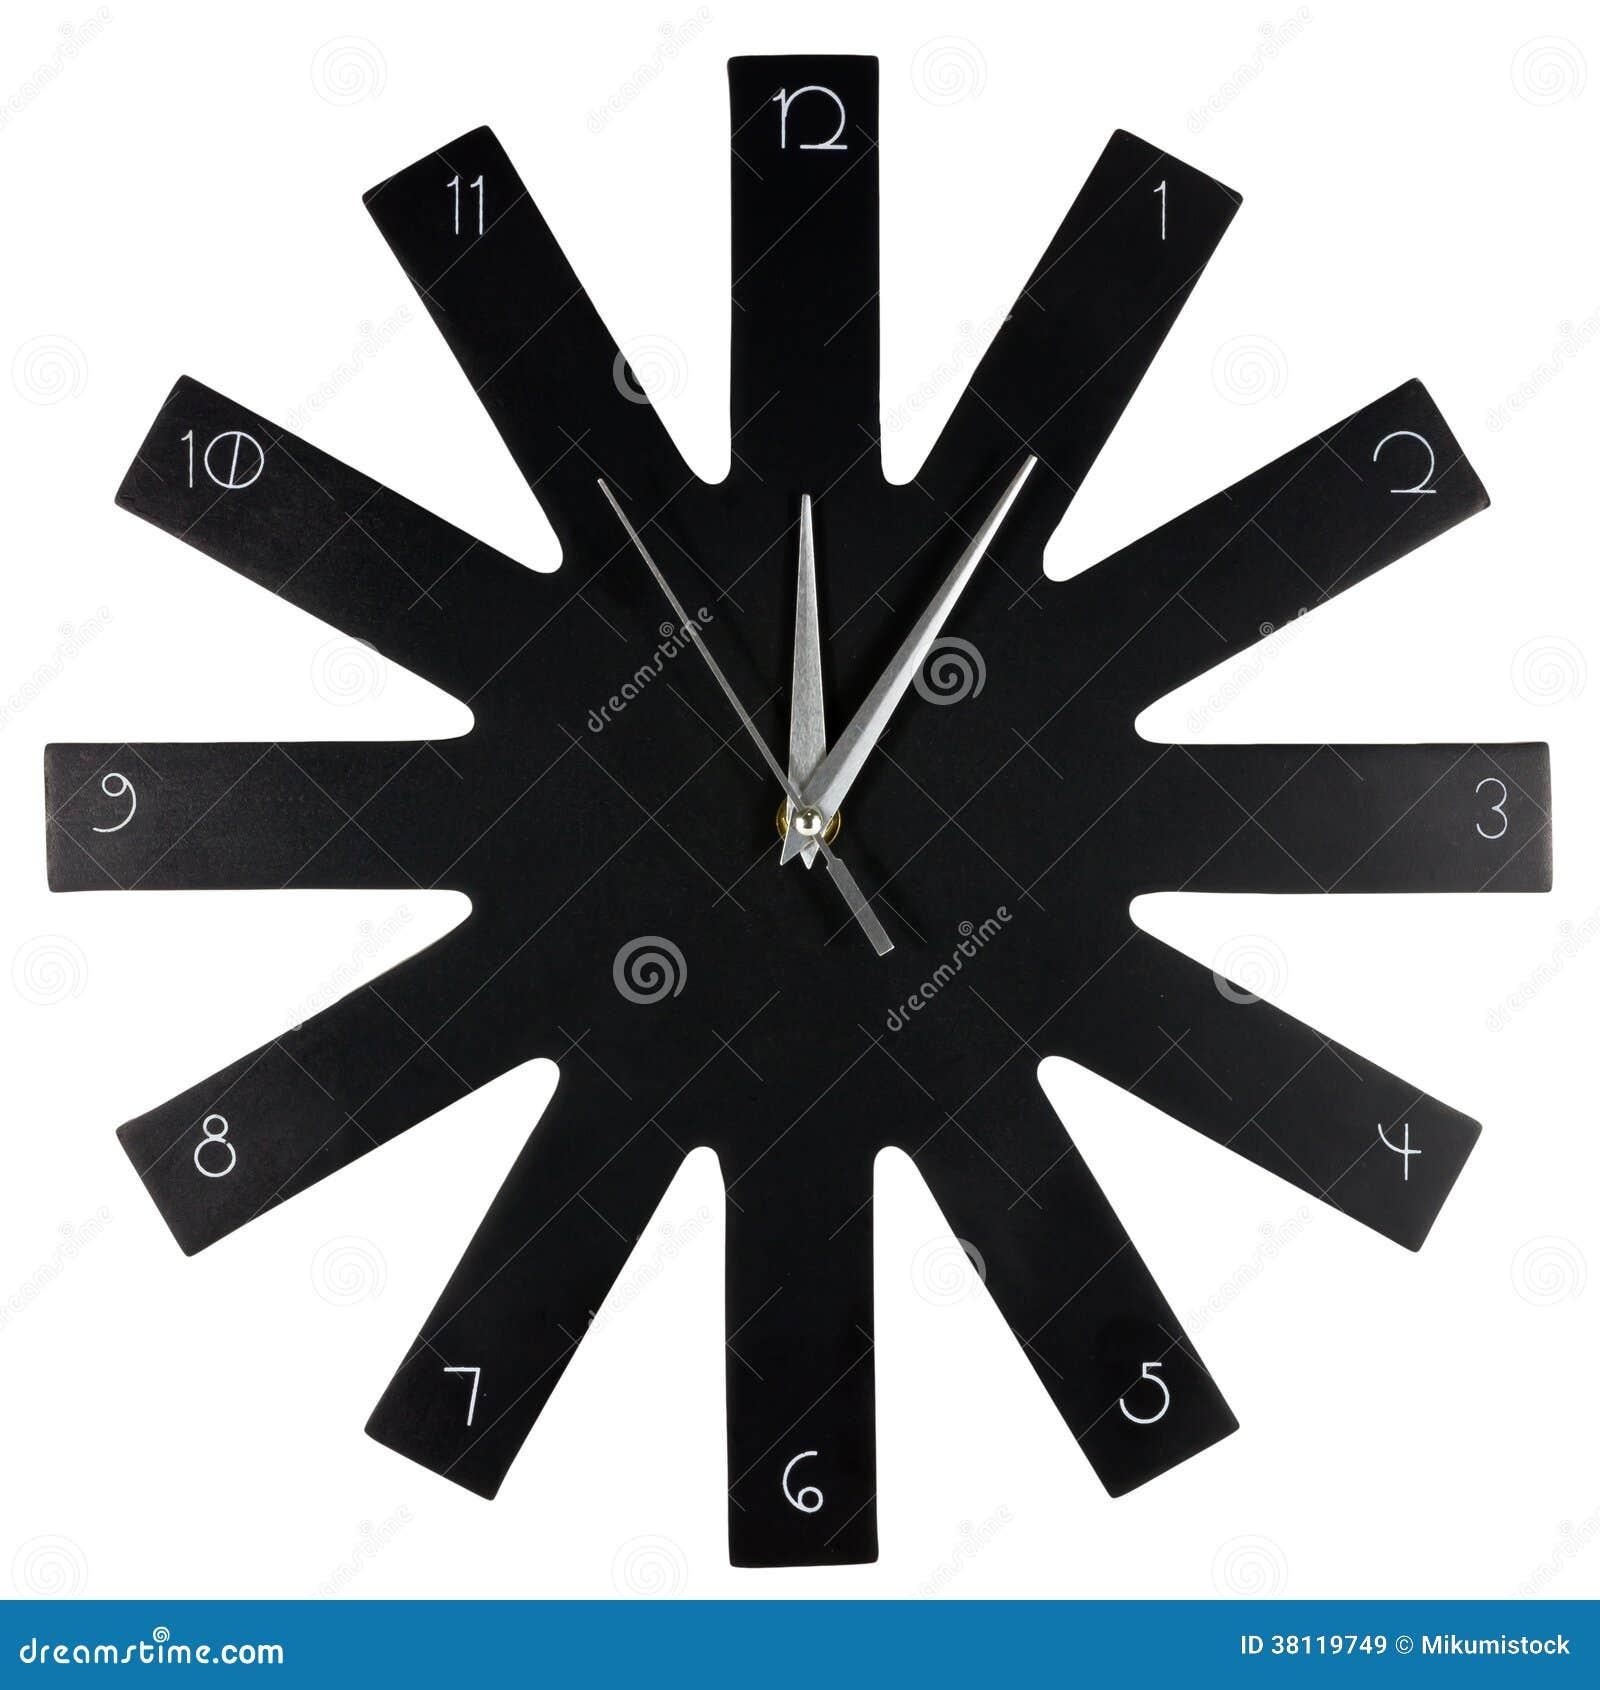 horloge murale moderne noire images libres de droits. Black Bedroom Furniture Sets. Home Design Ideas